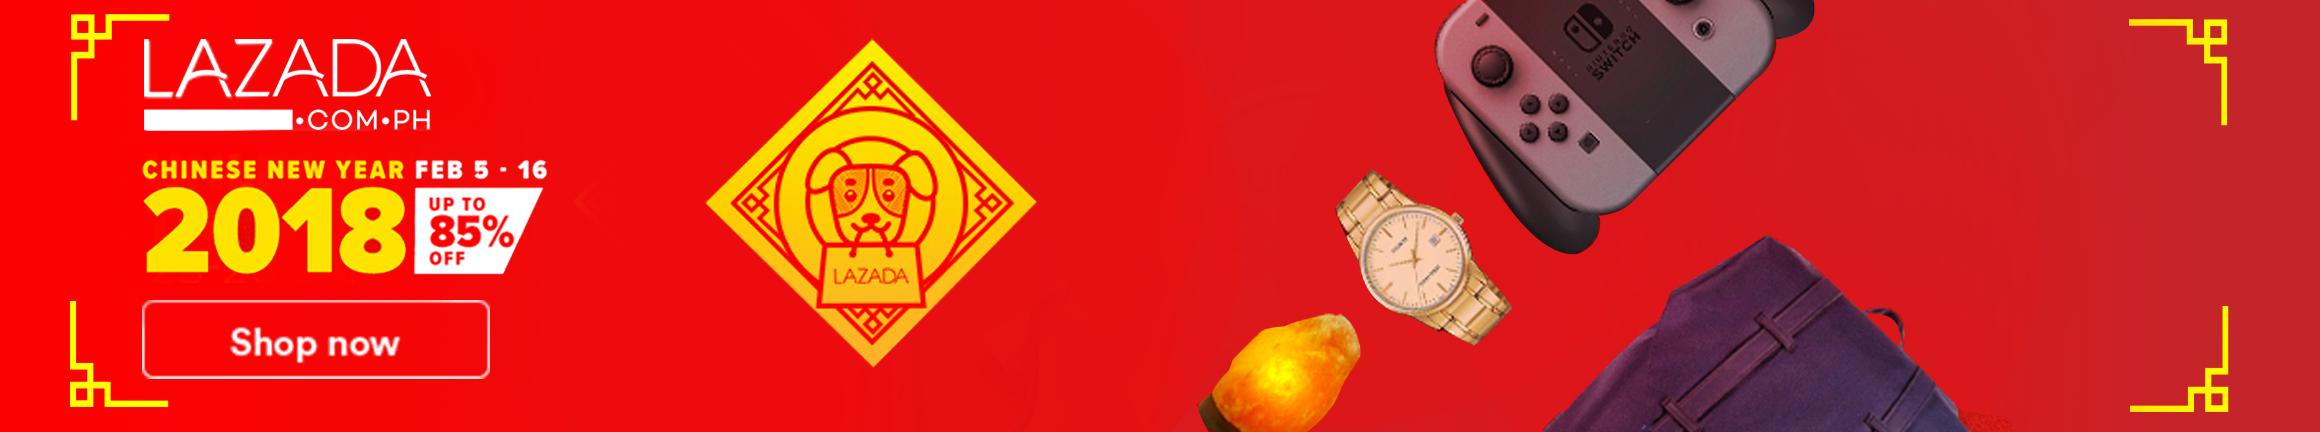 CNY Special – Upto 85% off